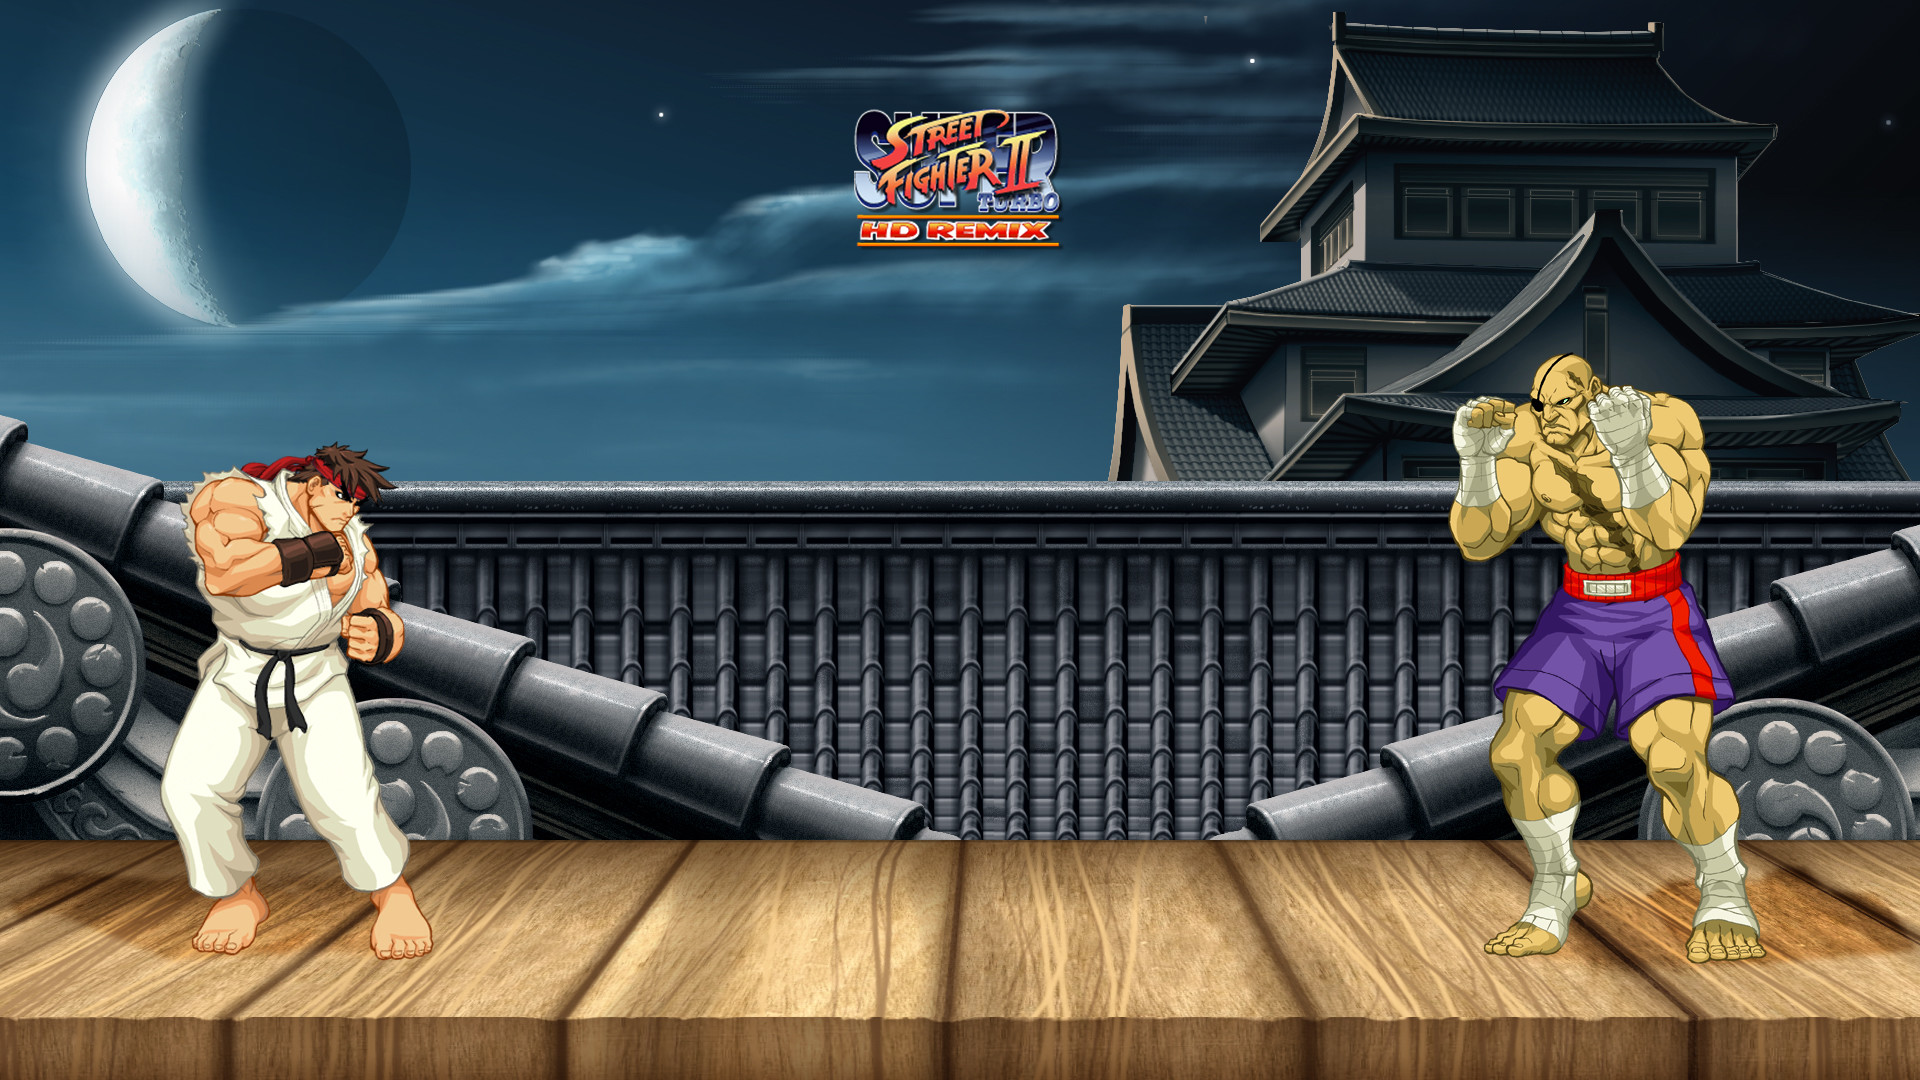 Asuras Wrath Street Fighter HD Wallpapers Backgrounds | HD Wallpapers |  Pinterest | Hd wallpaper, Wallpaper and Wallpaper backgrounds